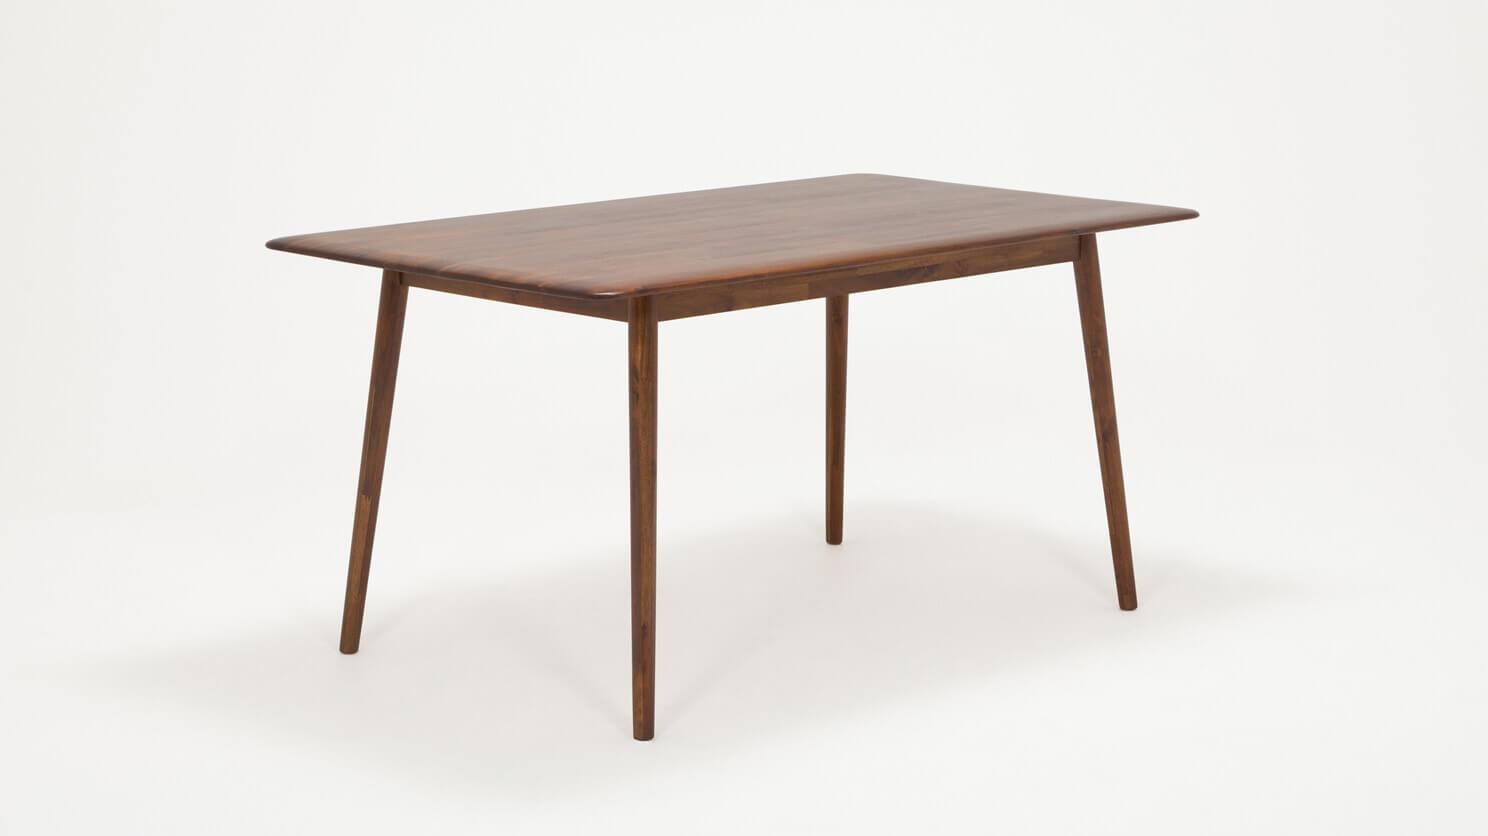 Kacia Dining Table Eq3 Modern, Eq3 Dining Room Tables